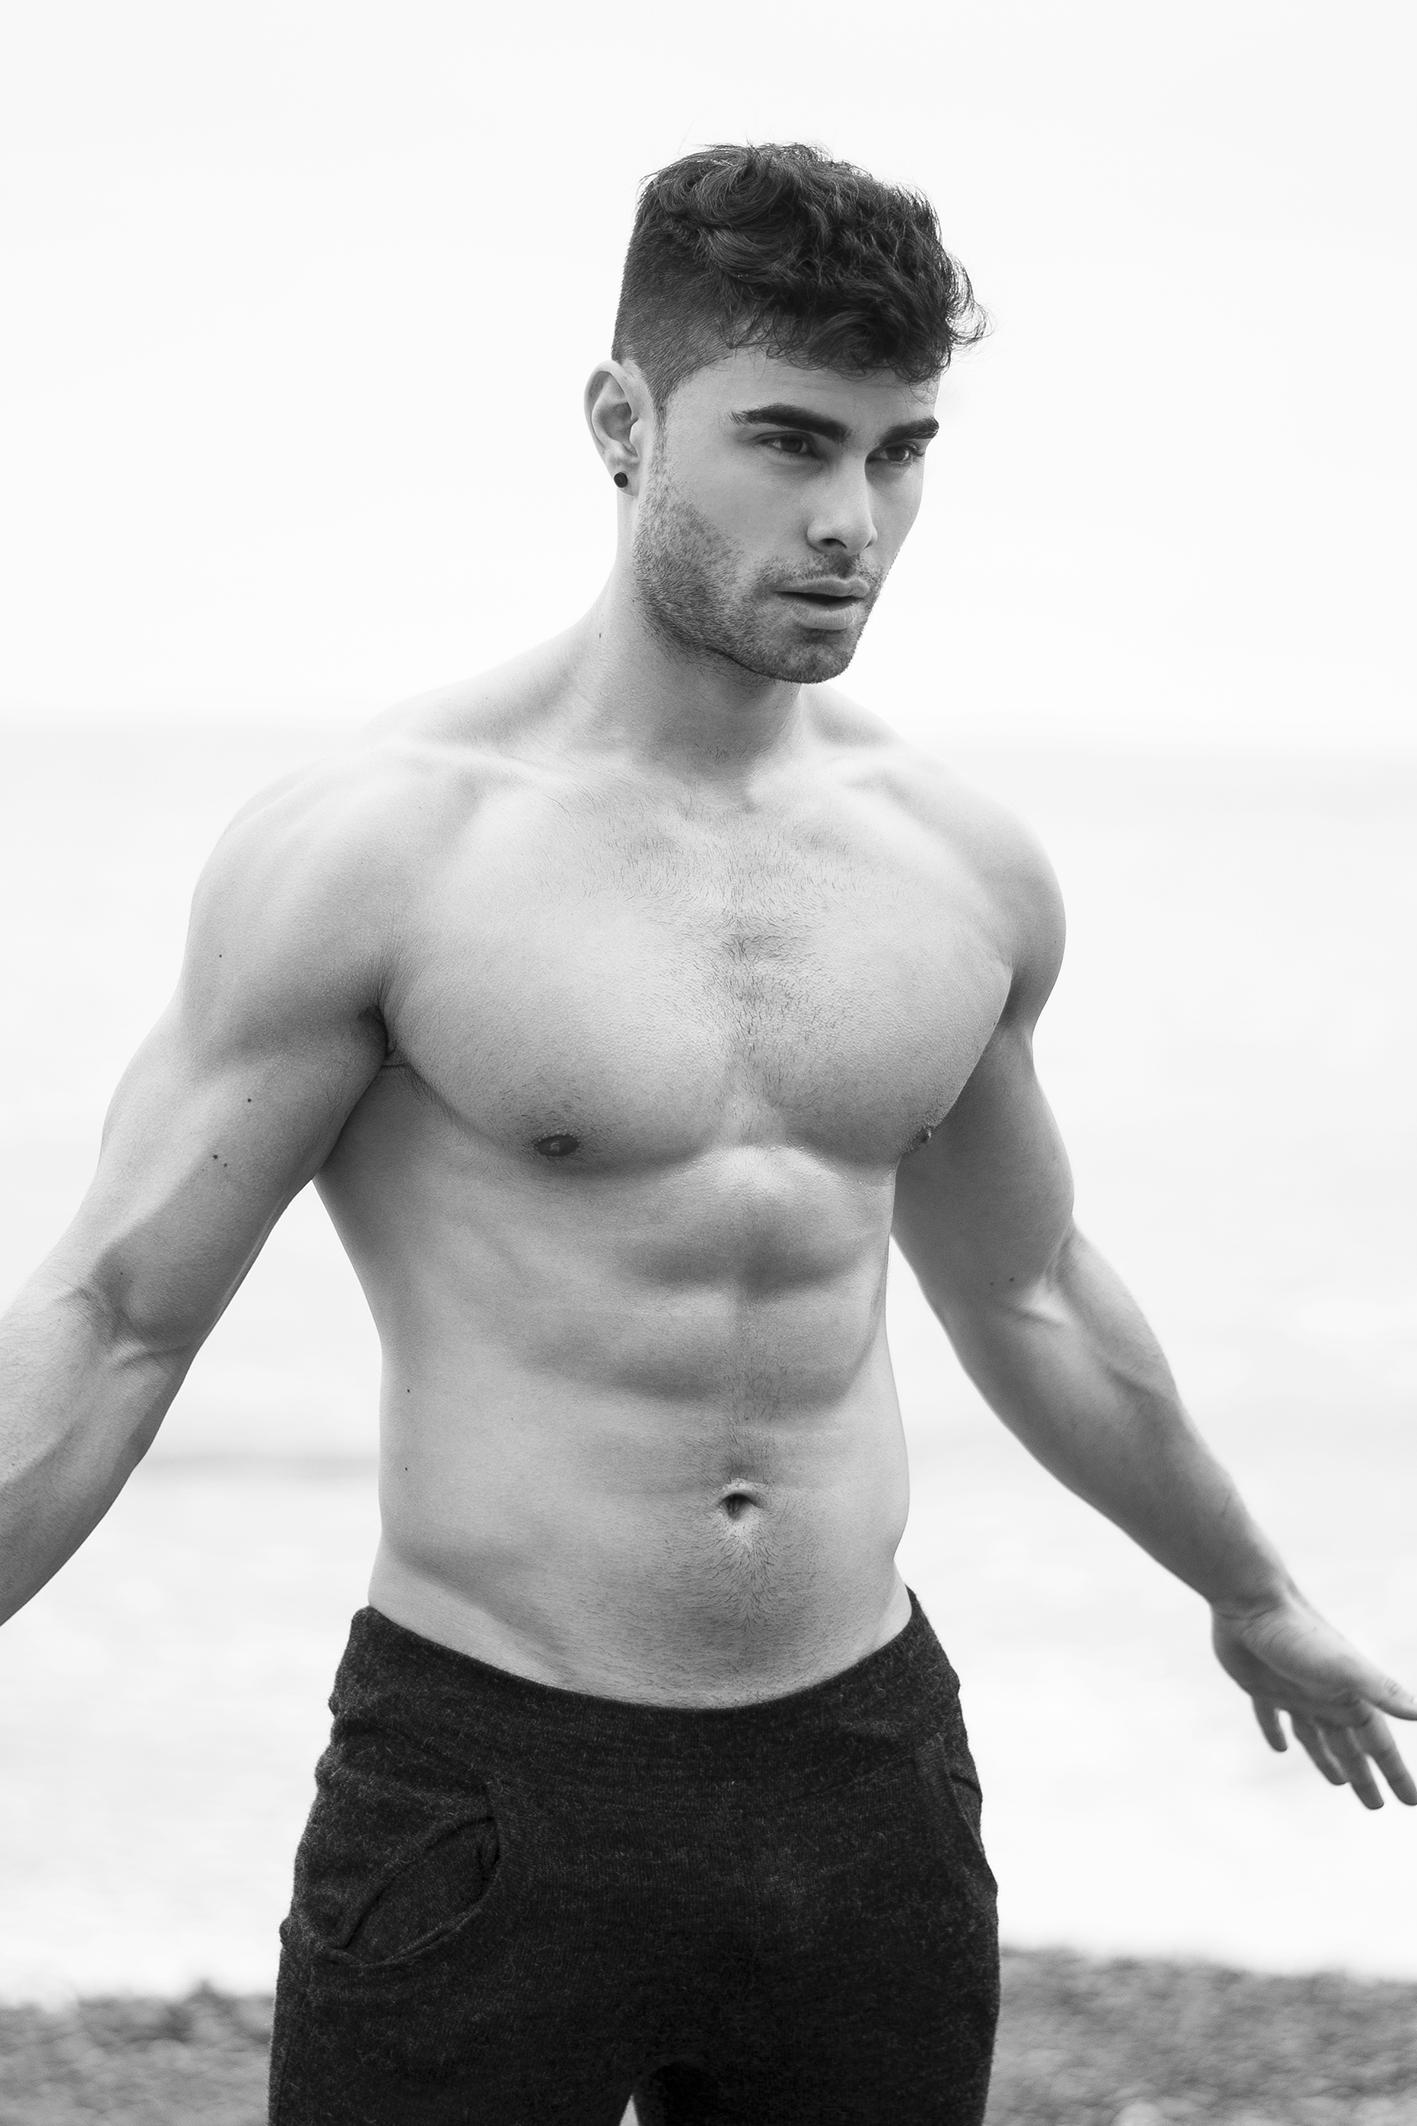 Alexi Descalzo Pam pa las mujeres Modelo Model male man sexy hot Summer Body Winter -005.jpg